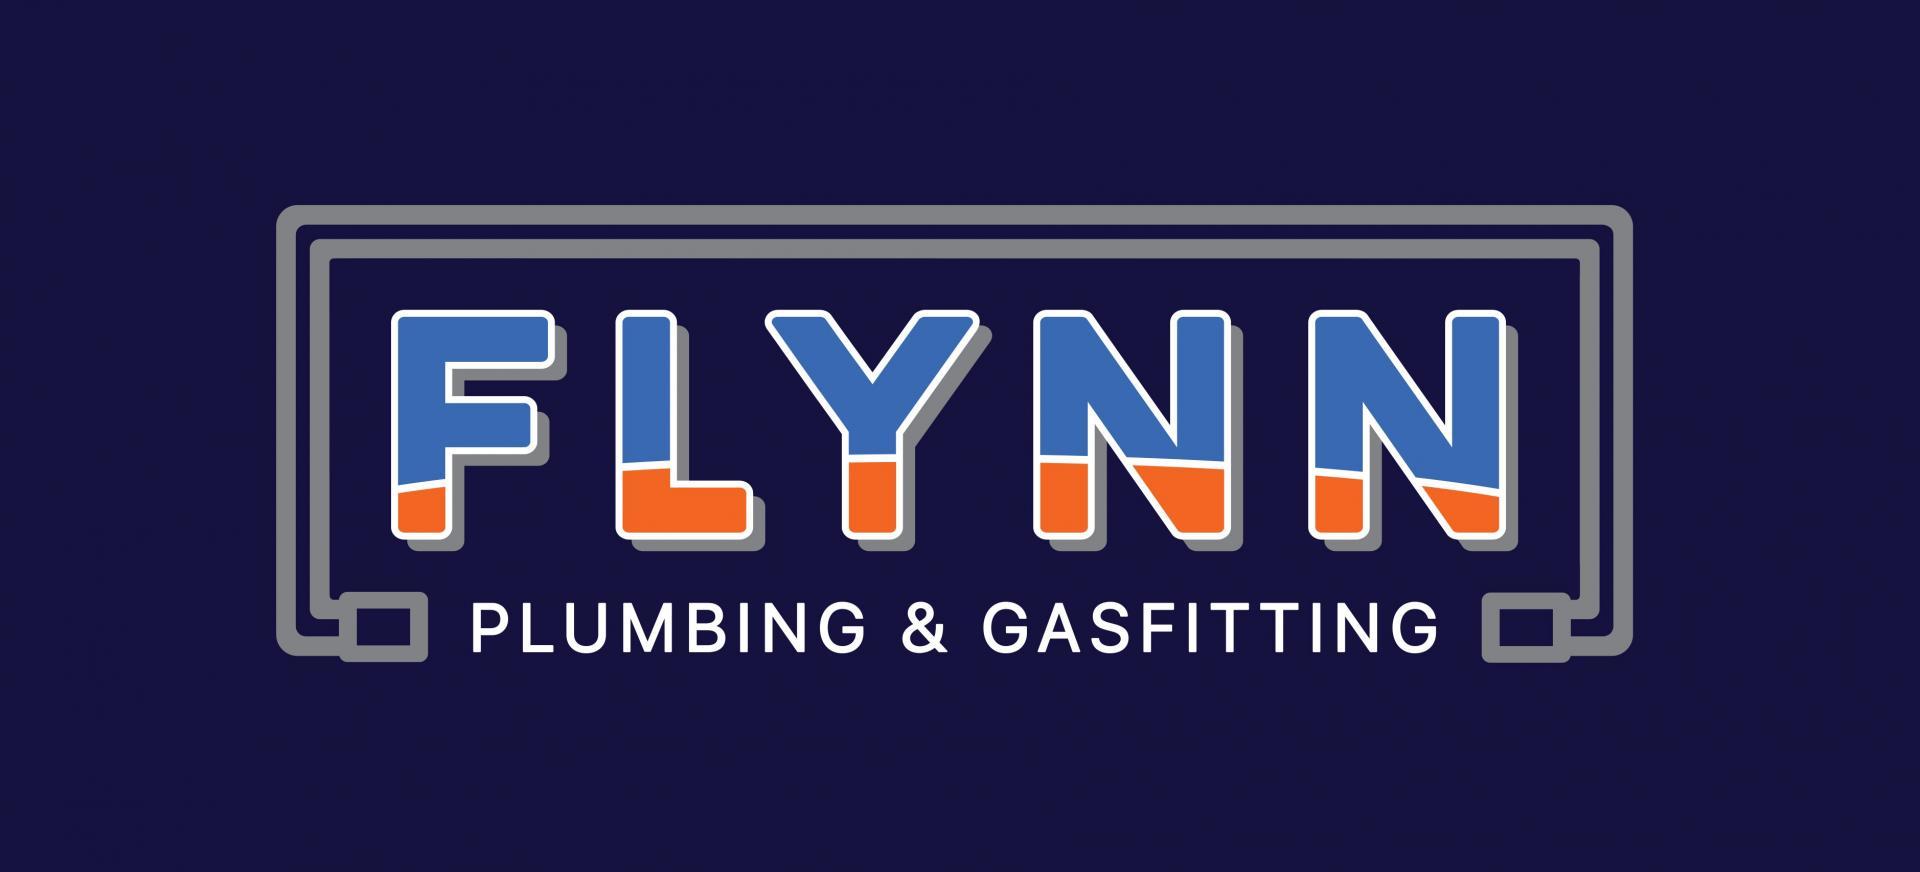 Flynn Plumbing & Gasfitting